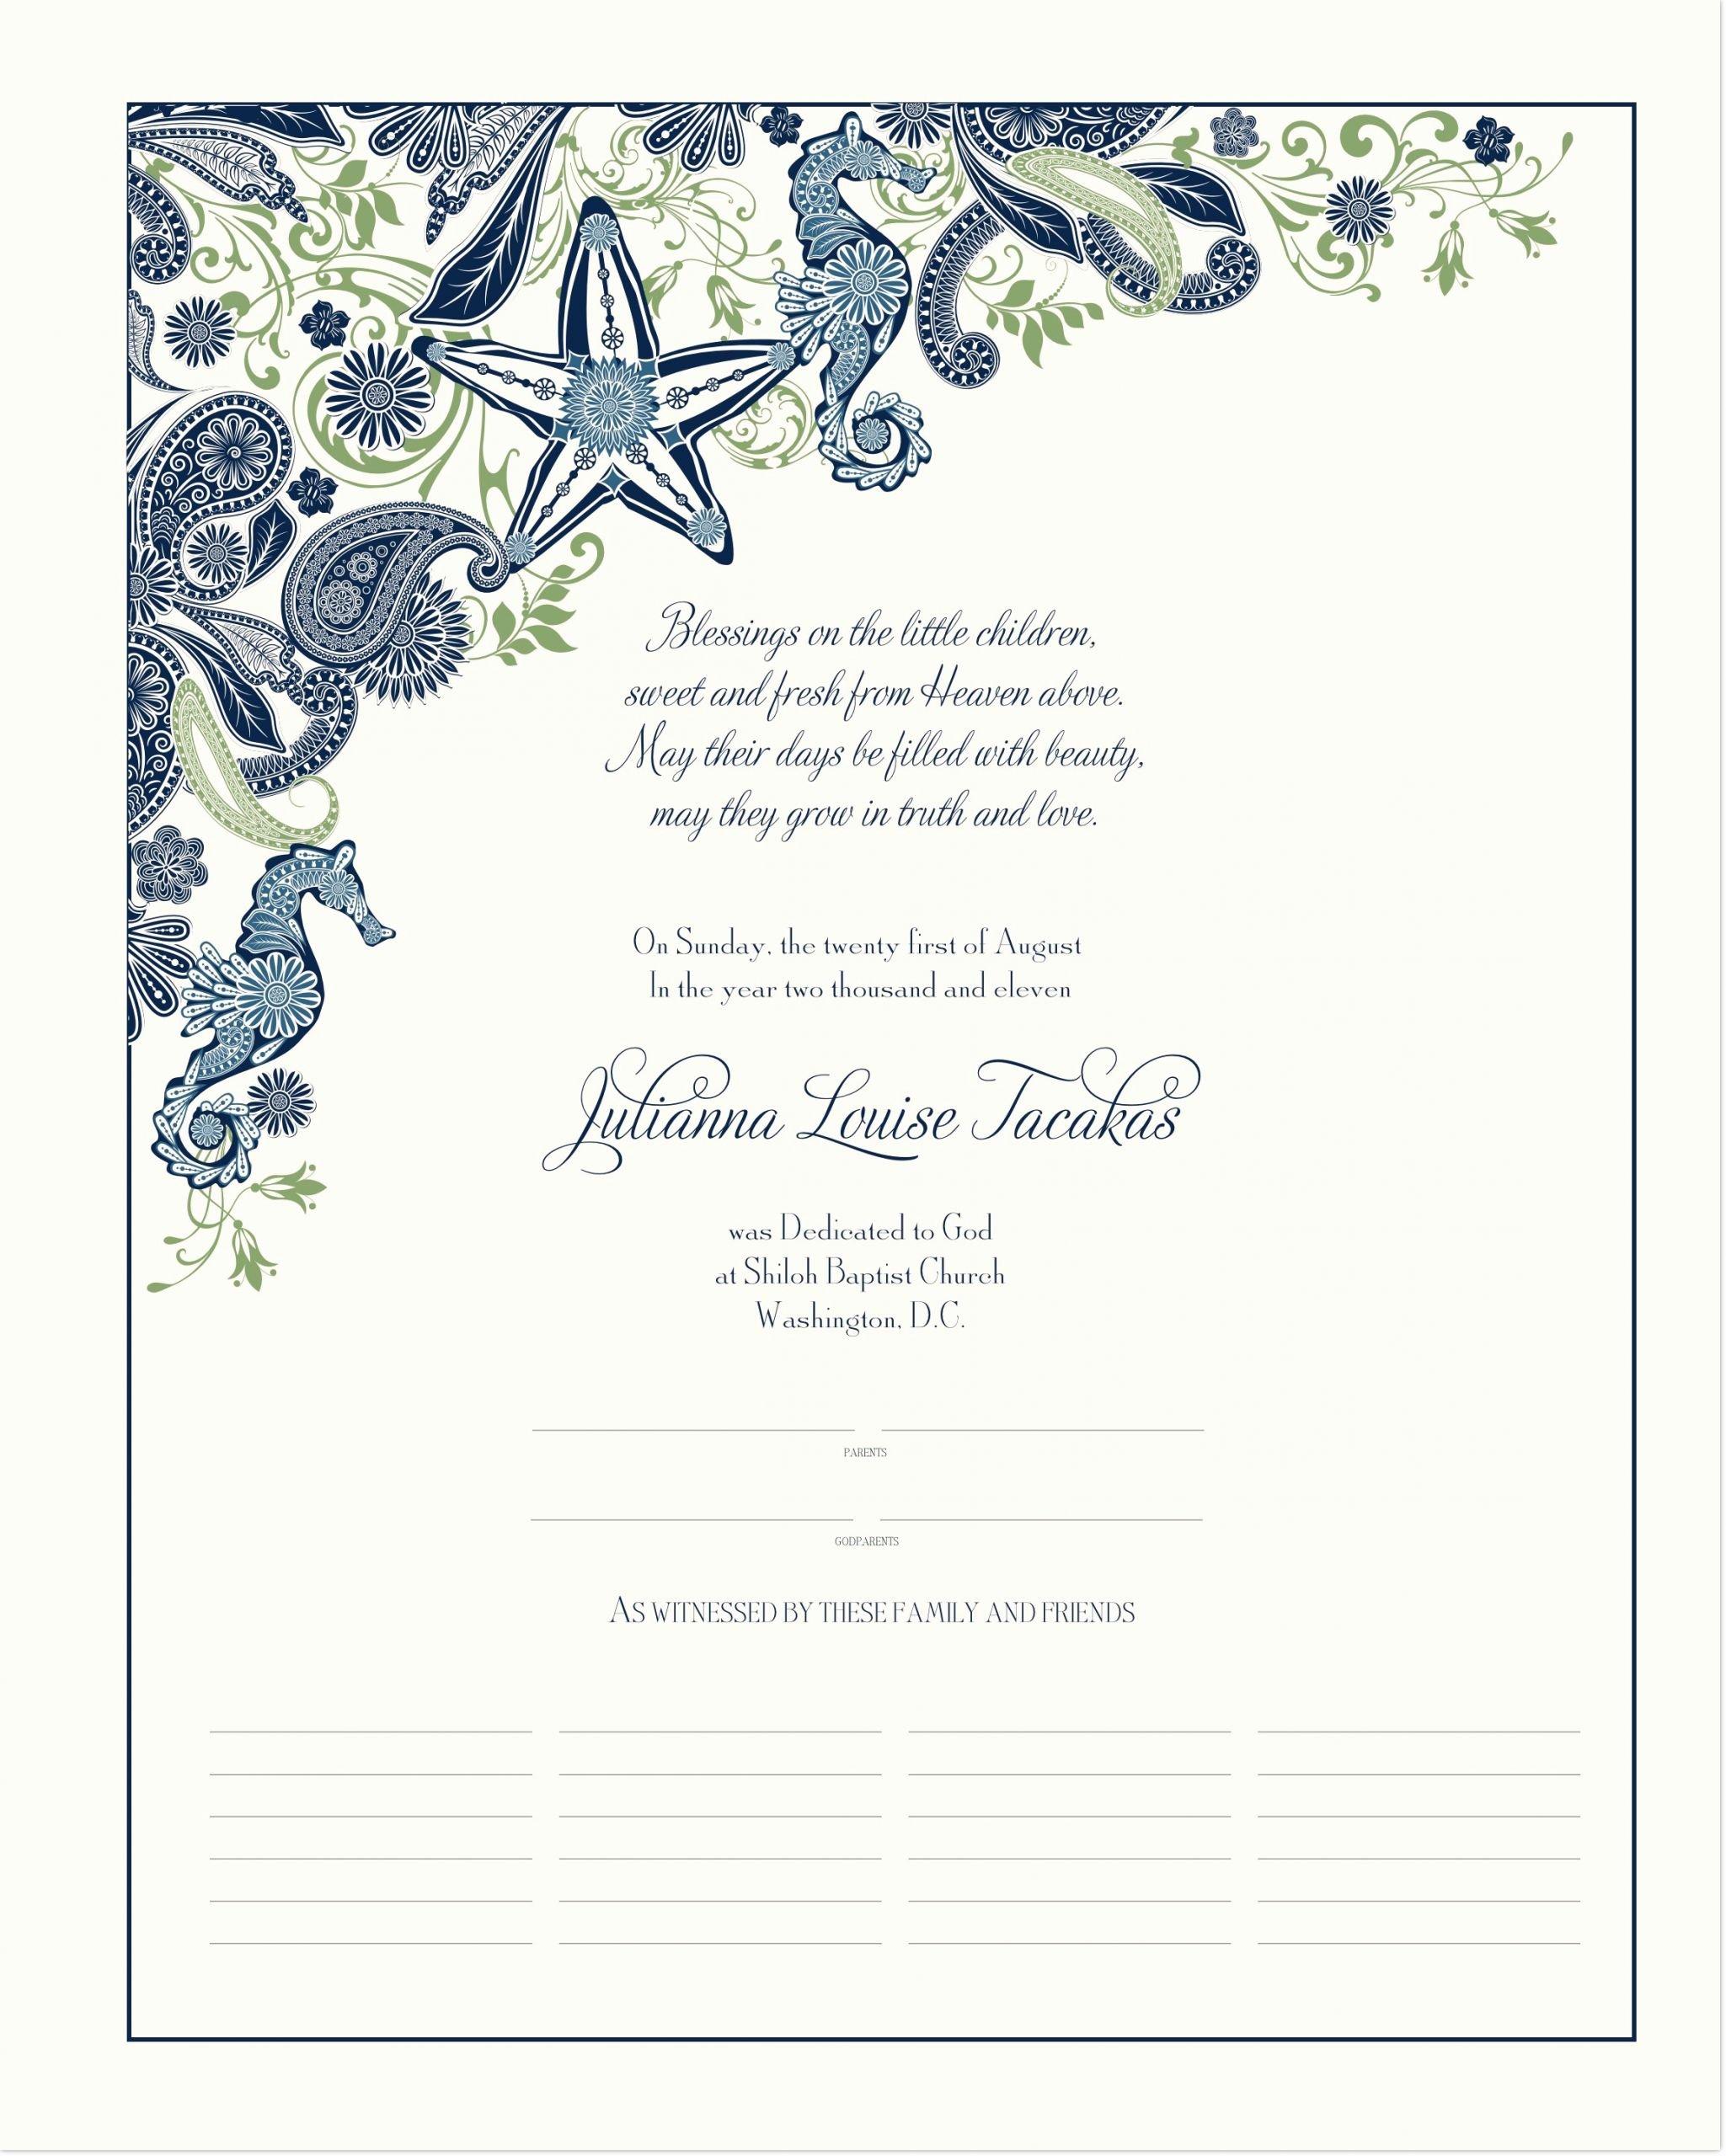 Baby Dedication Certificate Borders Lovely Paisley Ocean Dedication Baptism Certificate